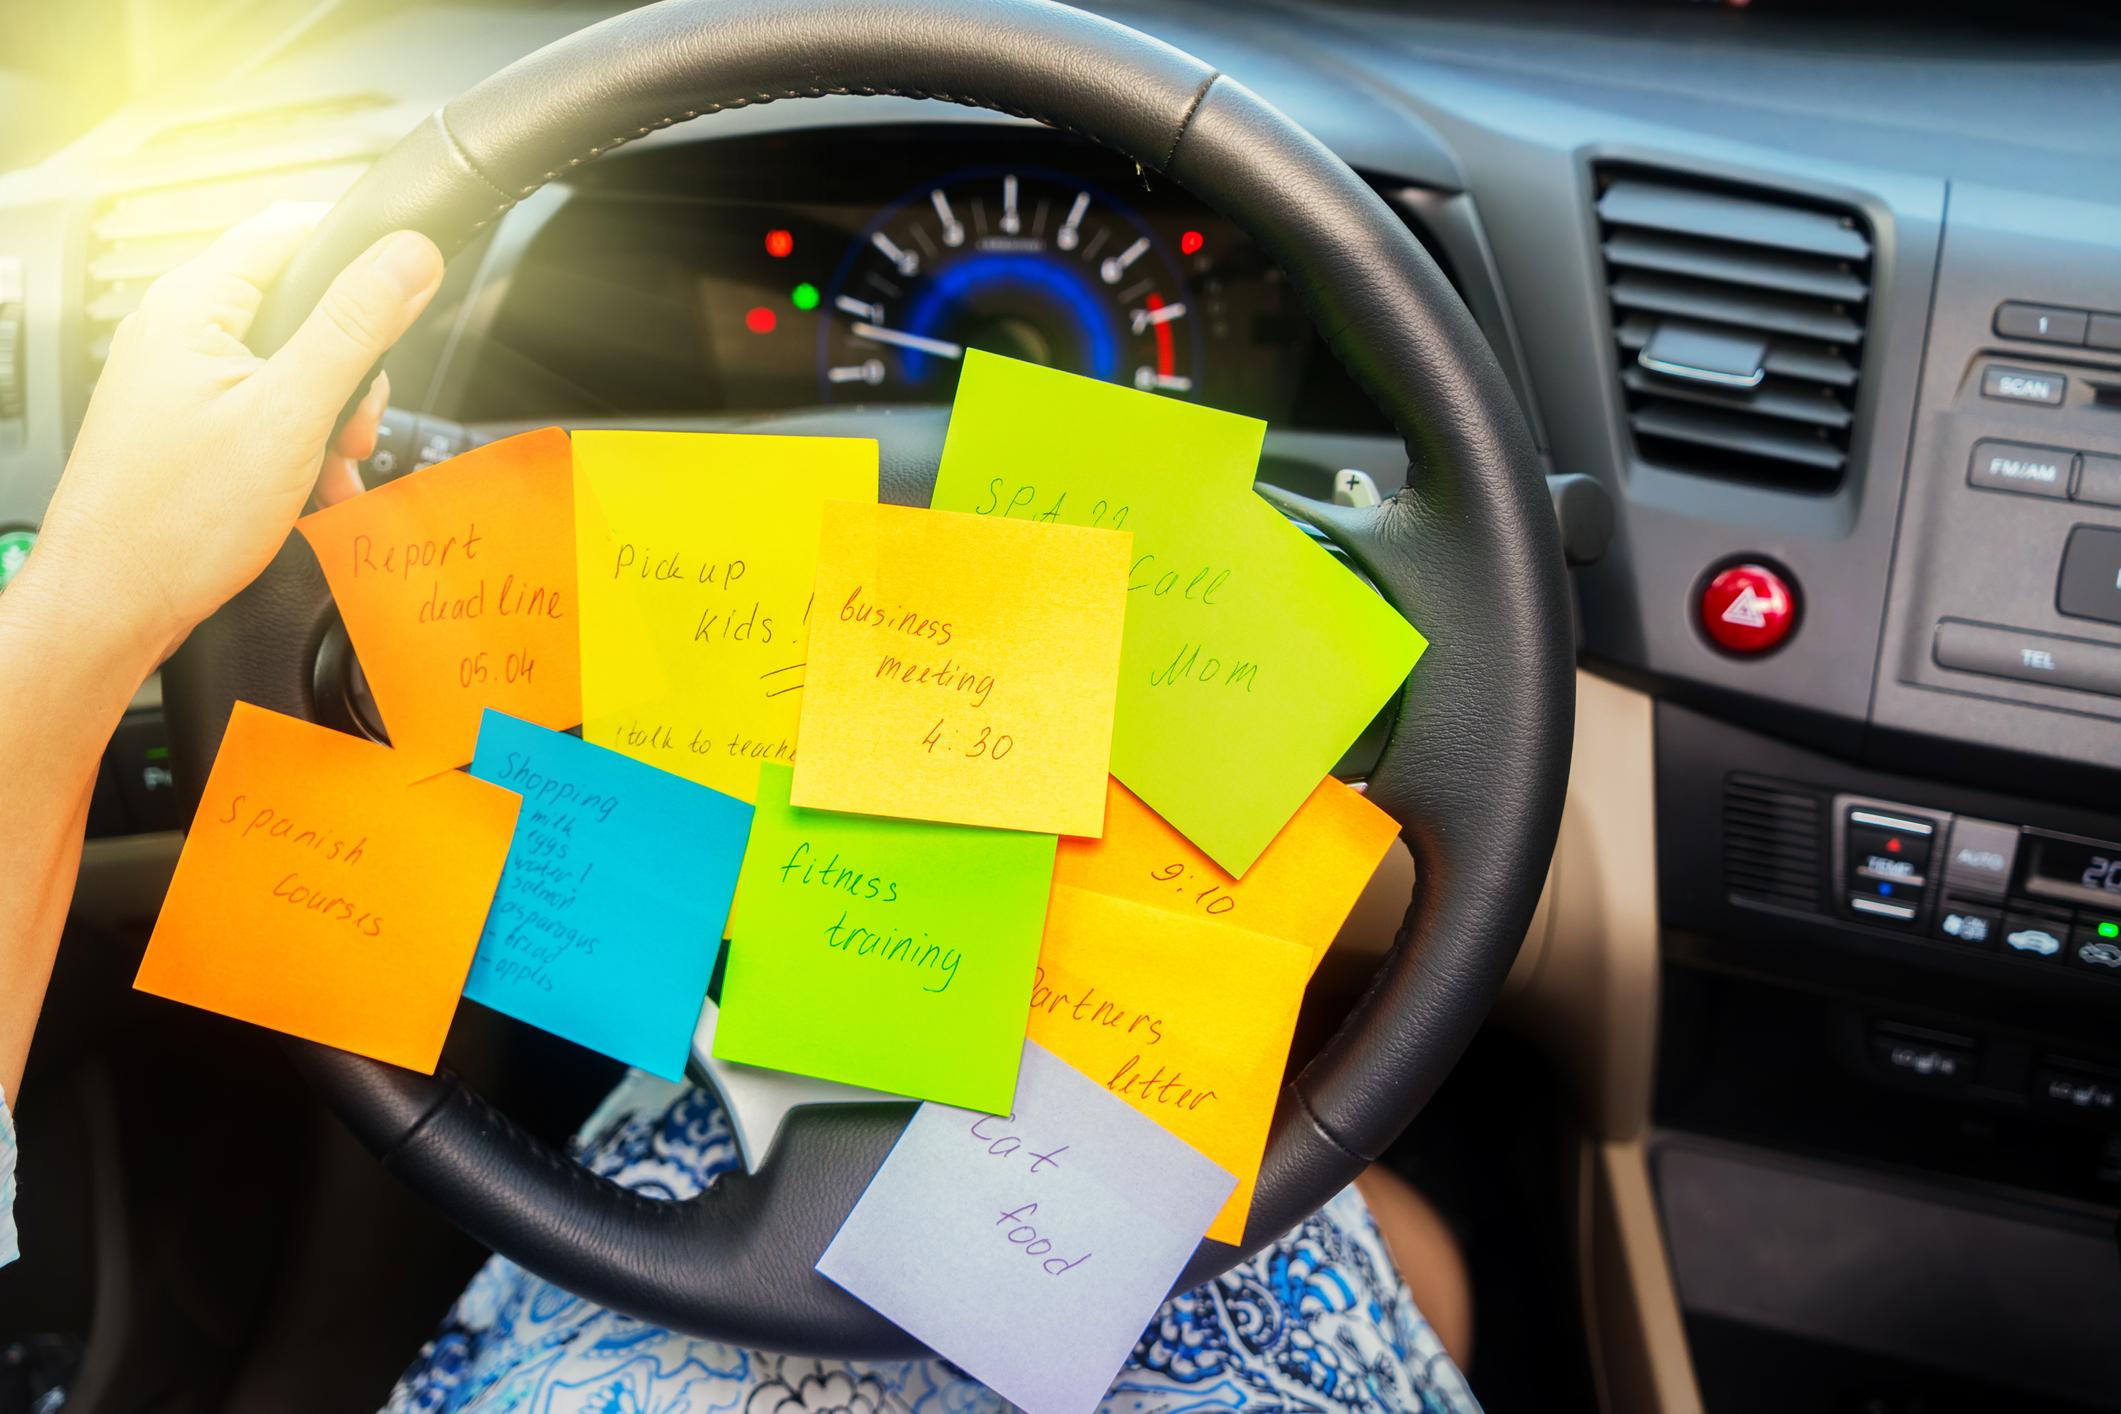 Post It Steering Wheel_iStock-652753748.jpg